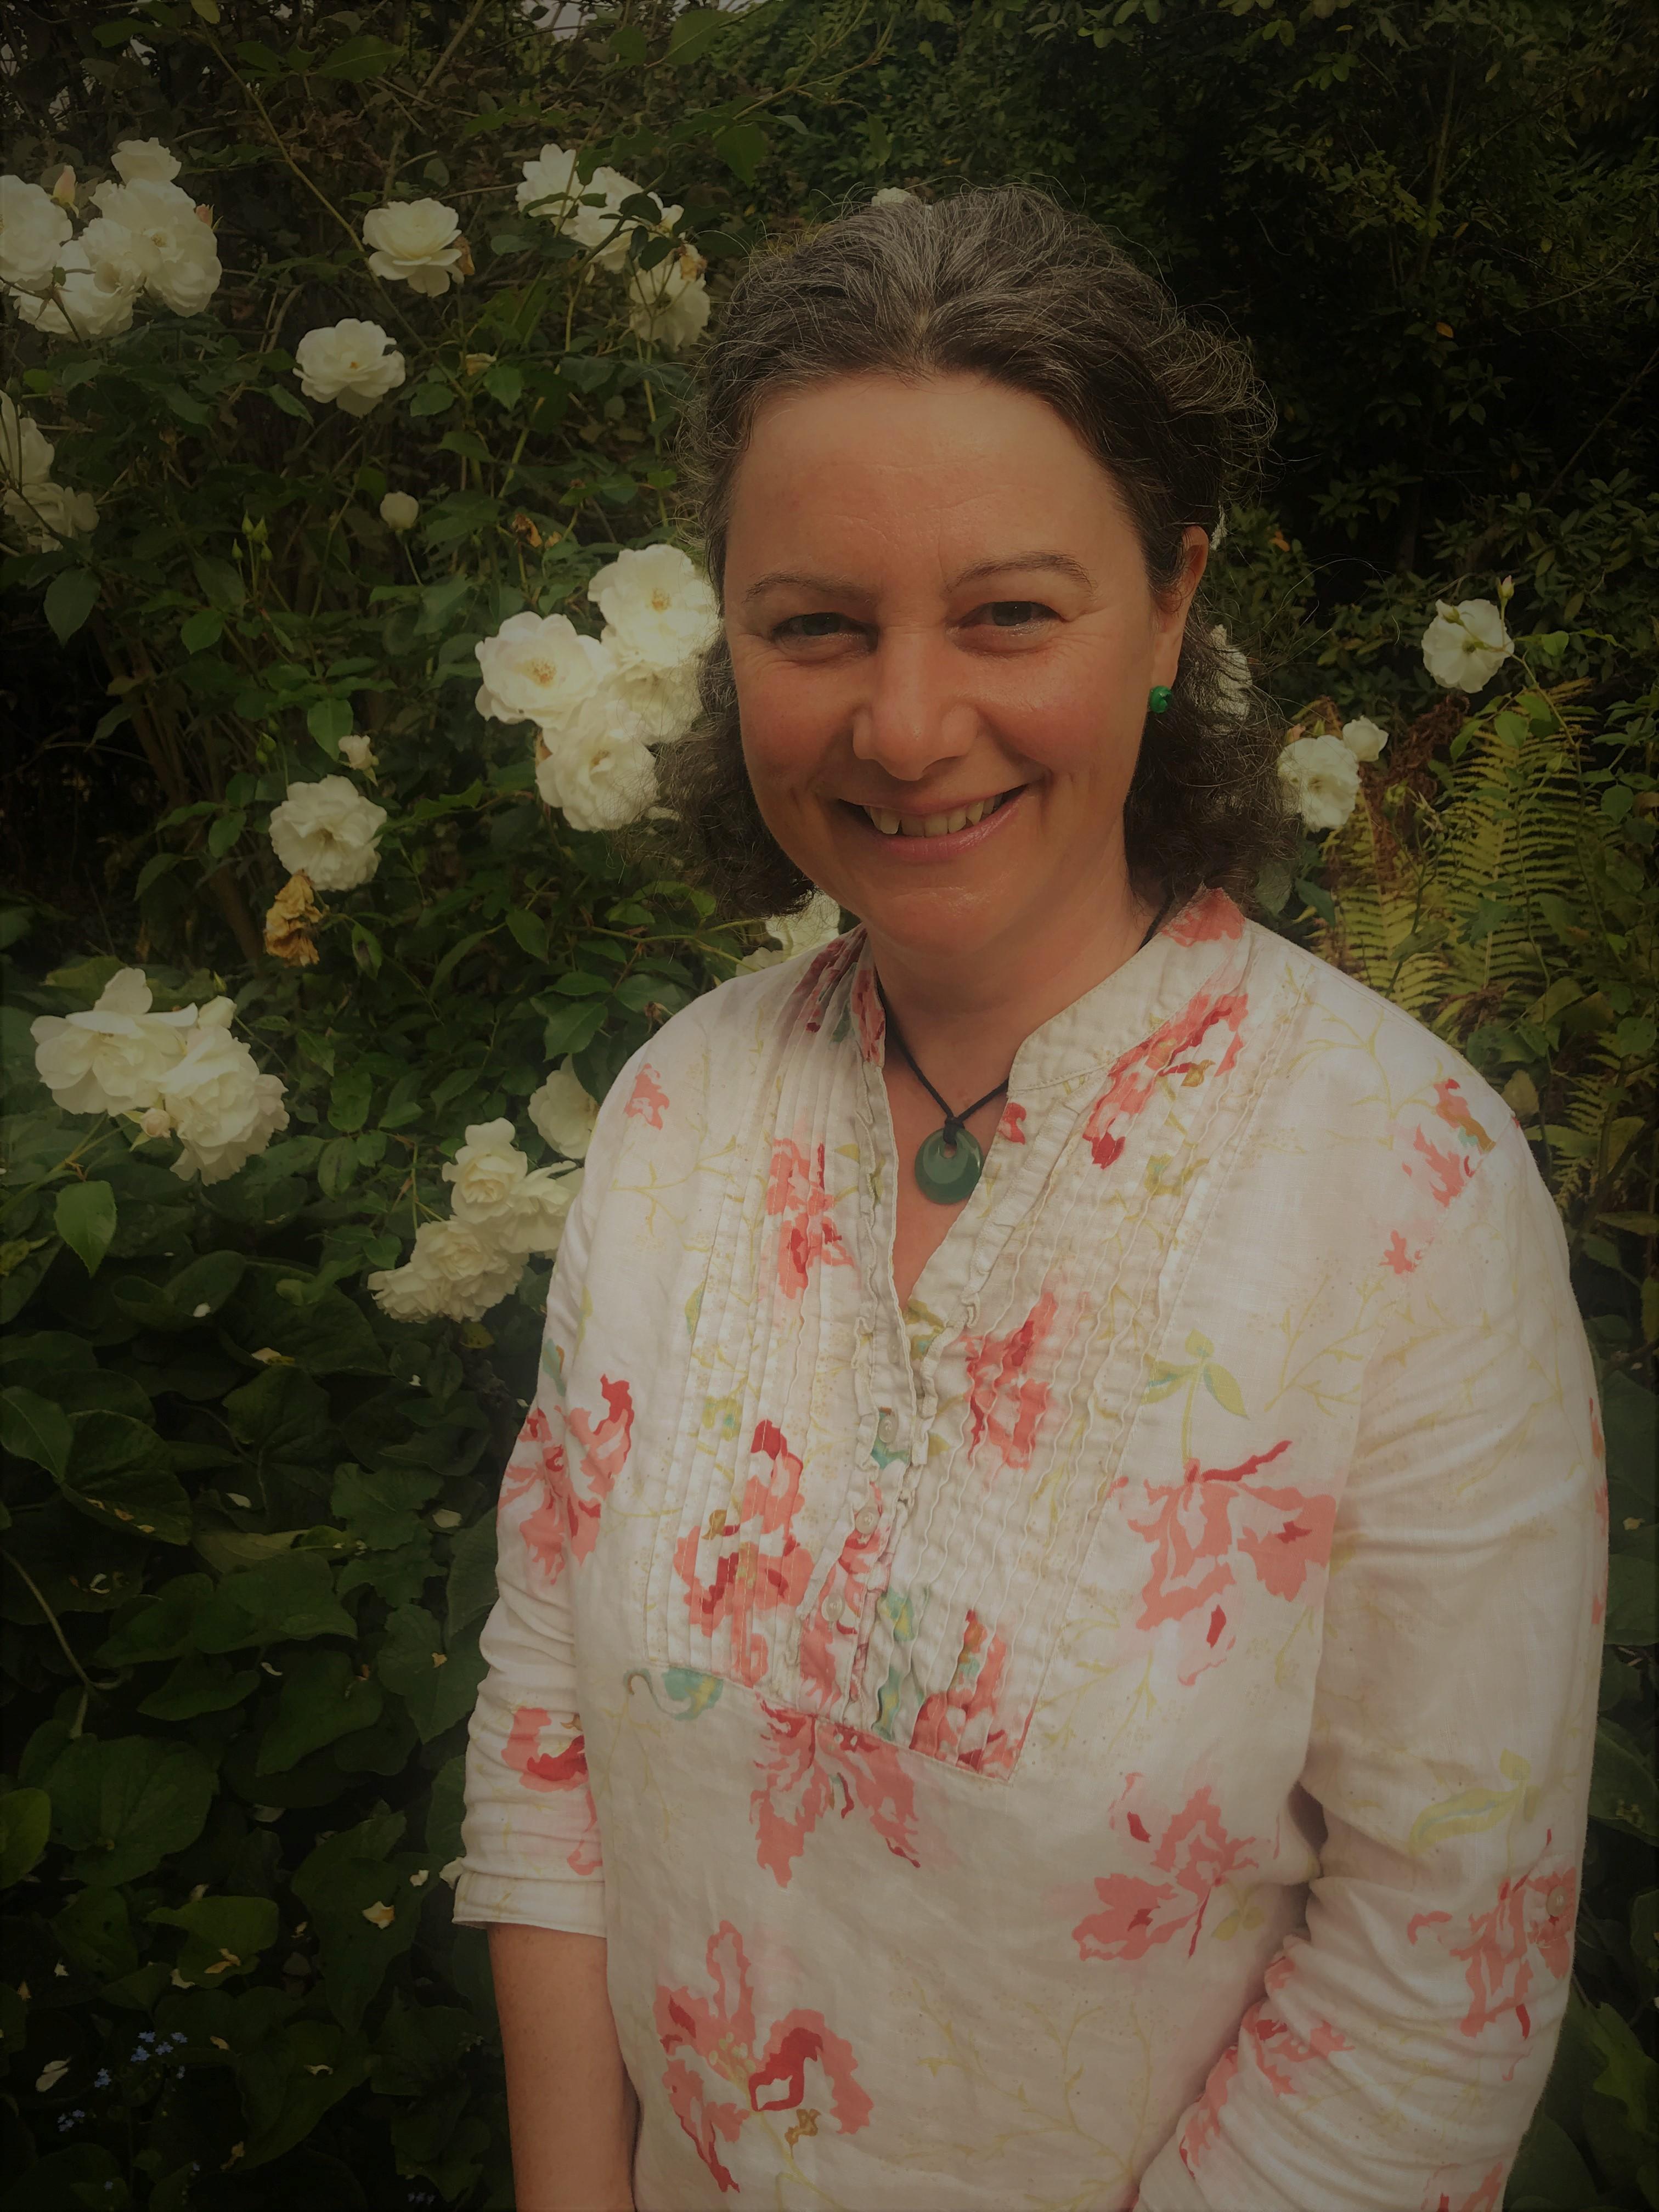 Margo O'Rourke